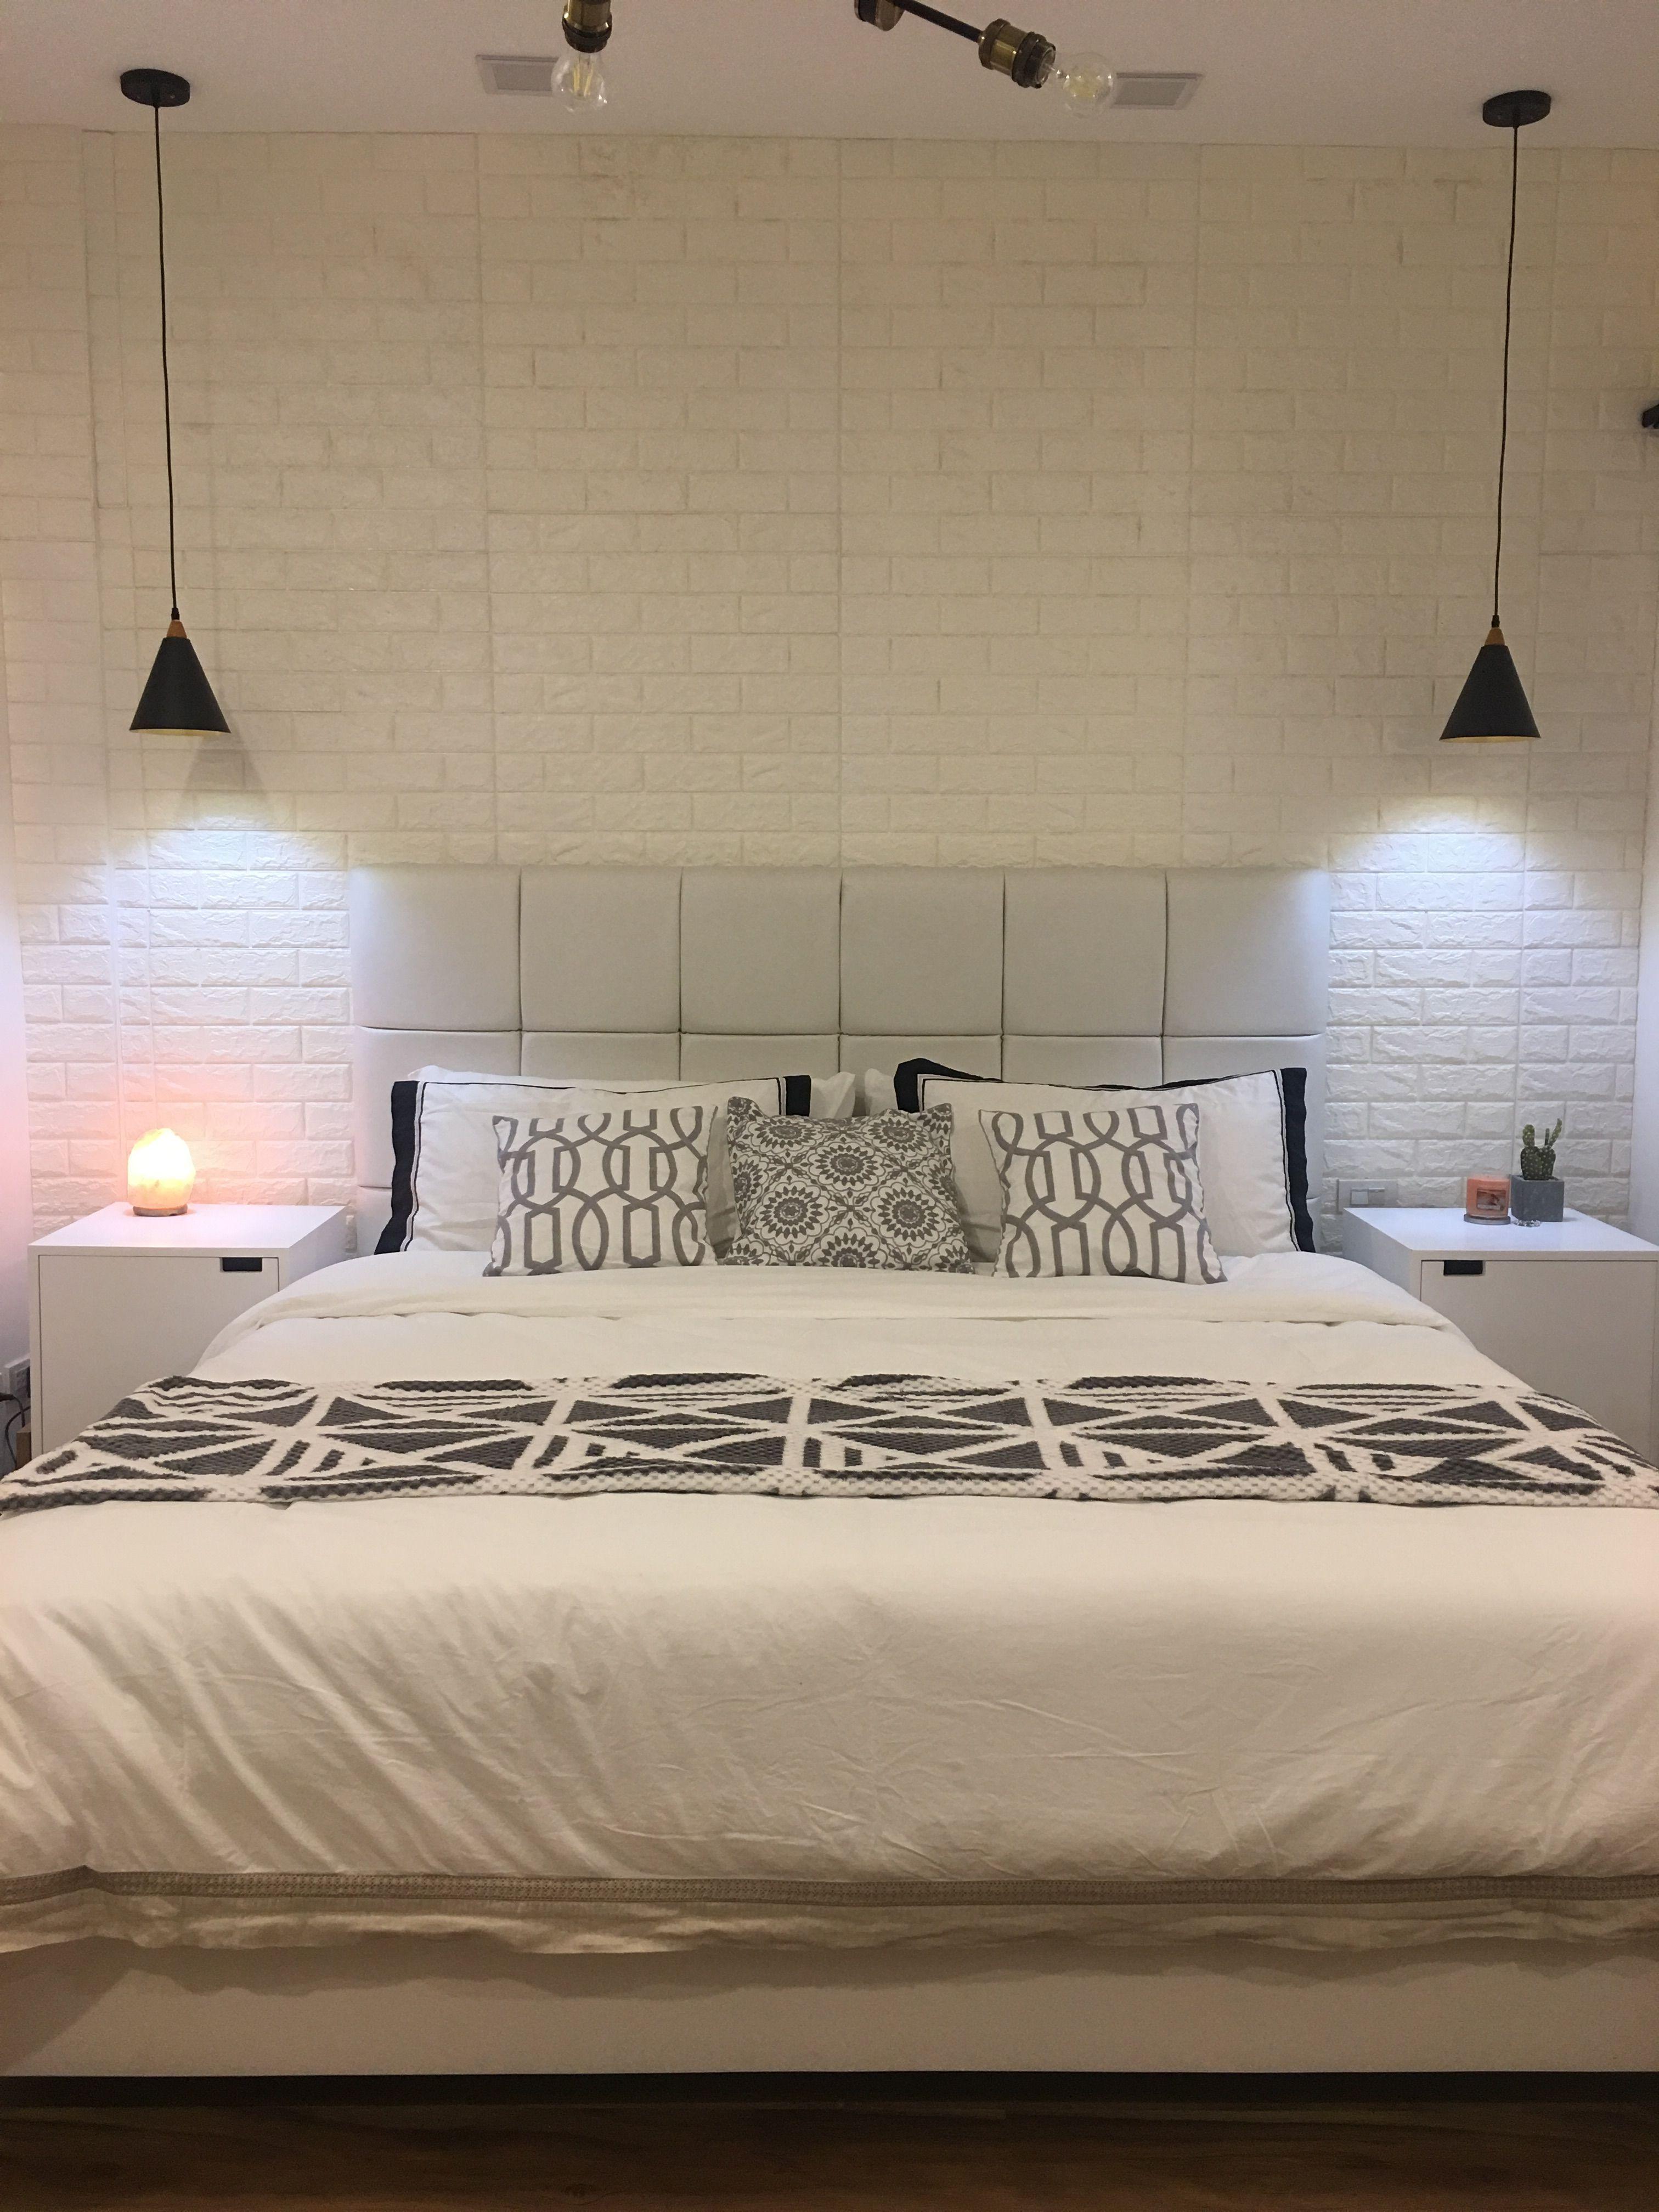 10 cheap and easy unique ideas minimalist bedroom ikea gray minimalist bedroom cozy headboards minimalist interior design home minimalist bedroom ikea walk